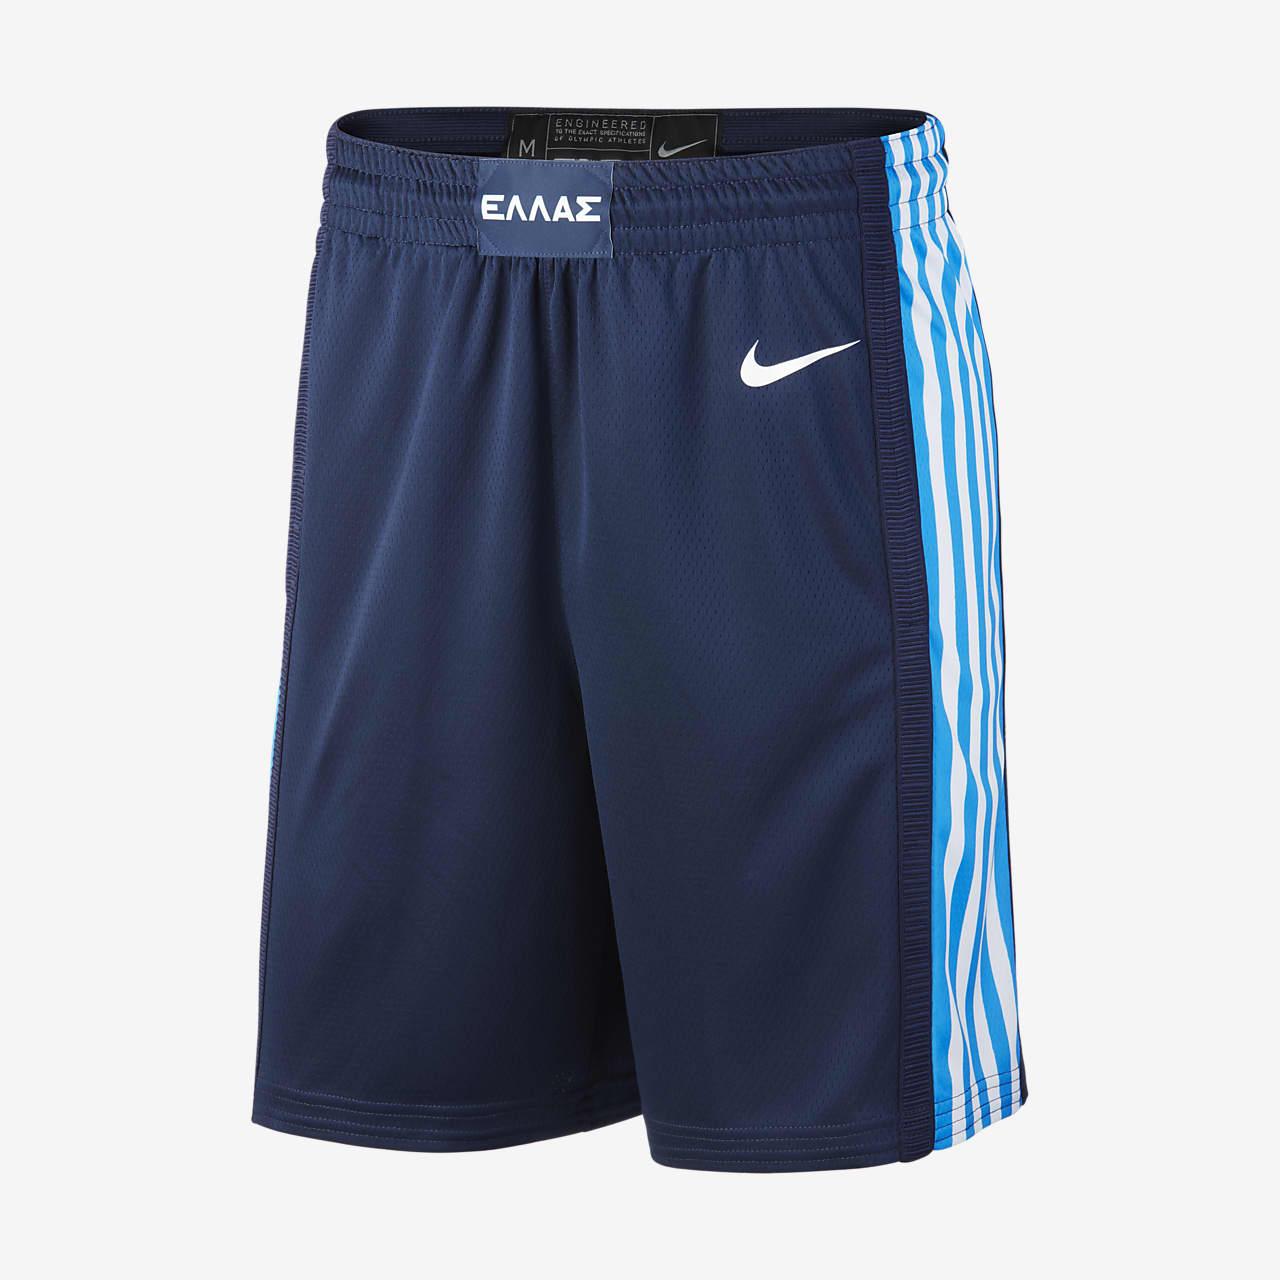 Greece Nike (Road) Limited Men's Basketball Shorts